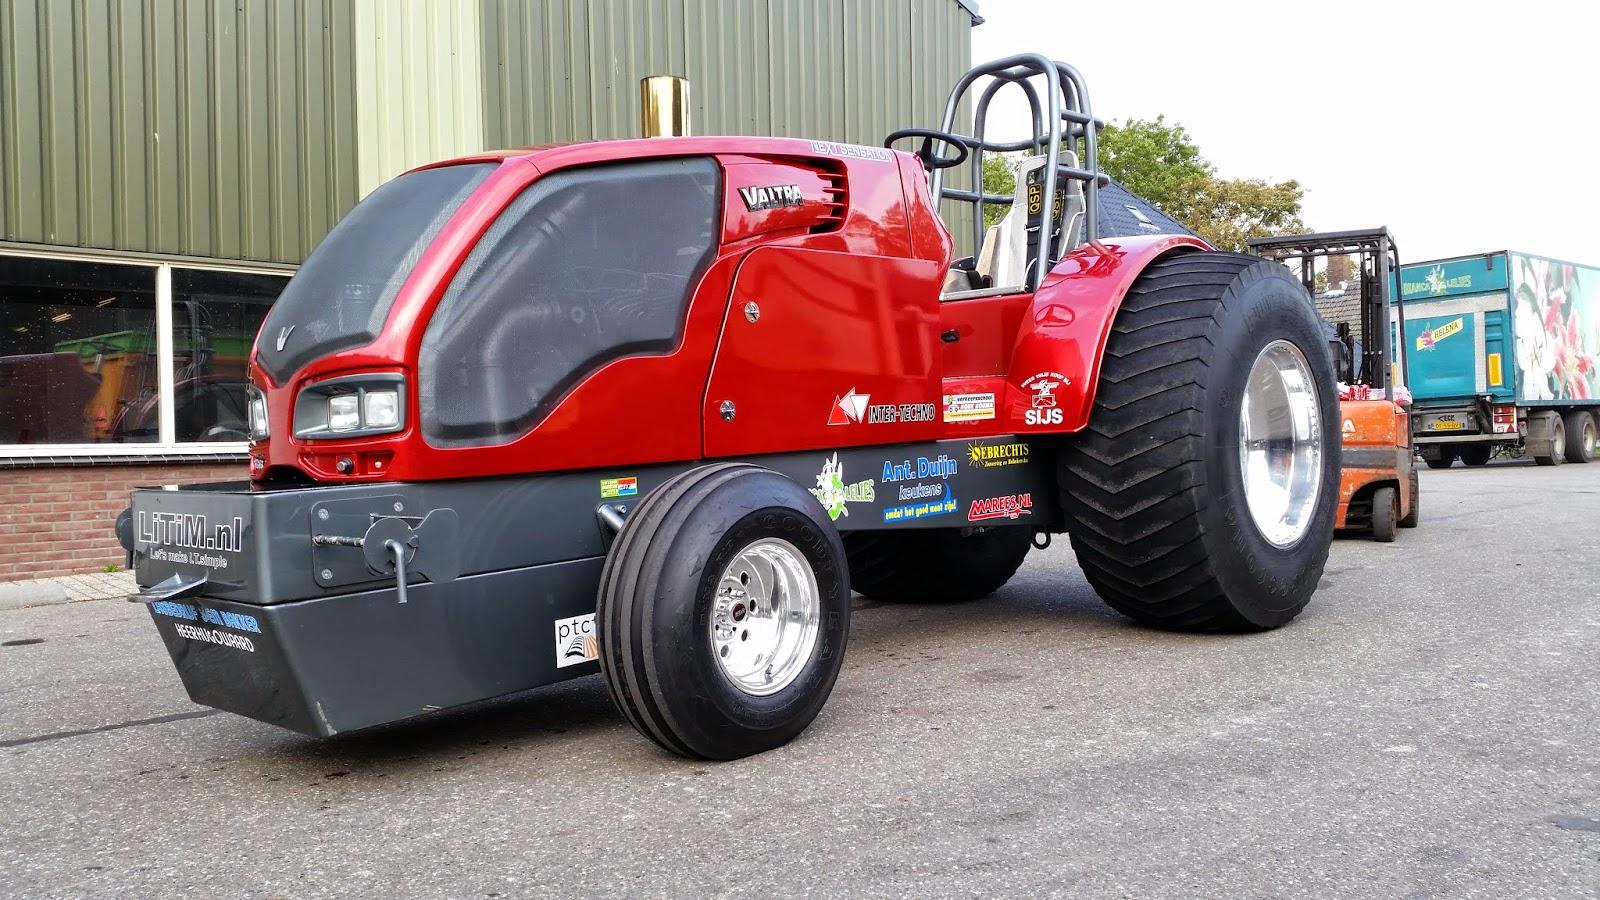 Tractor pulling news pullingworld.com: te koop for sale pro